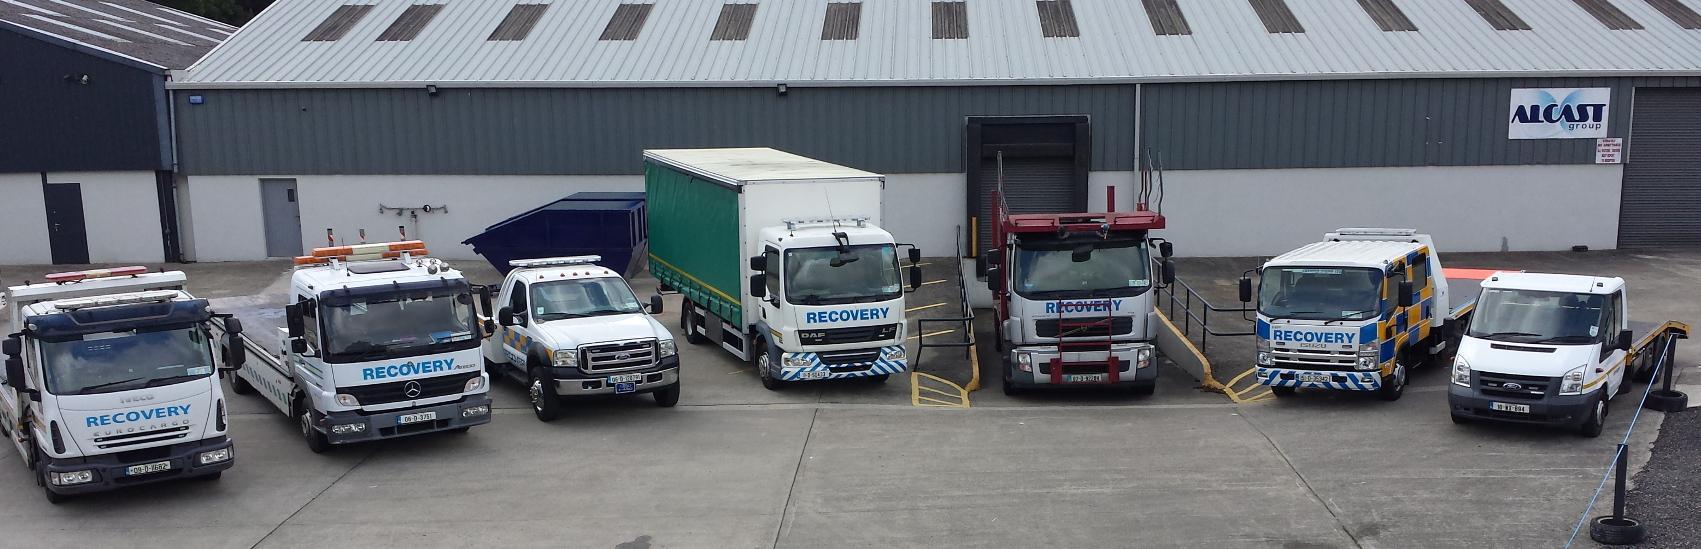 60ba580324 Truck Hire in Sligo County